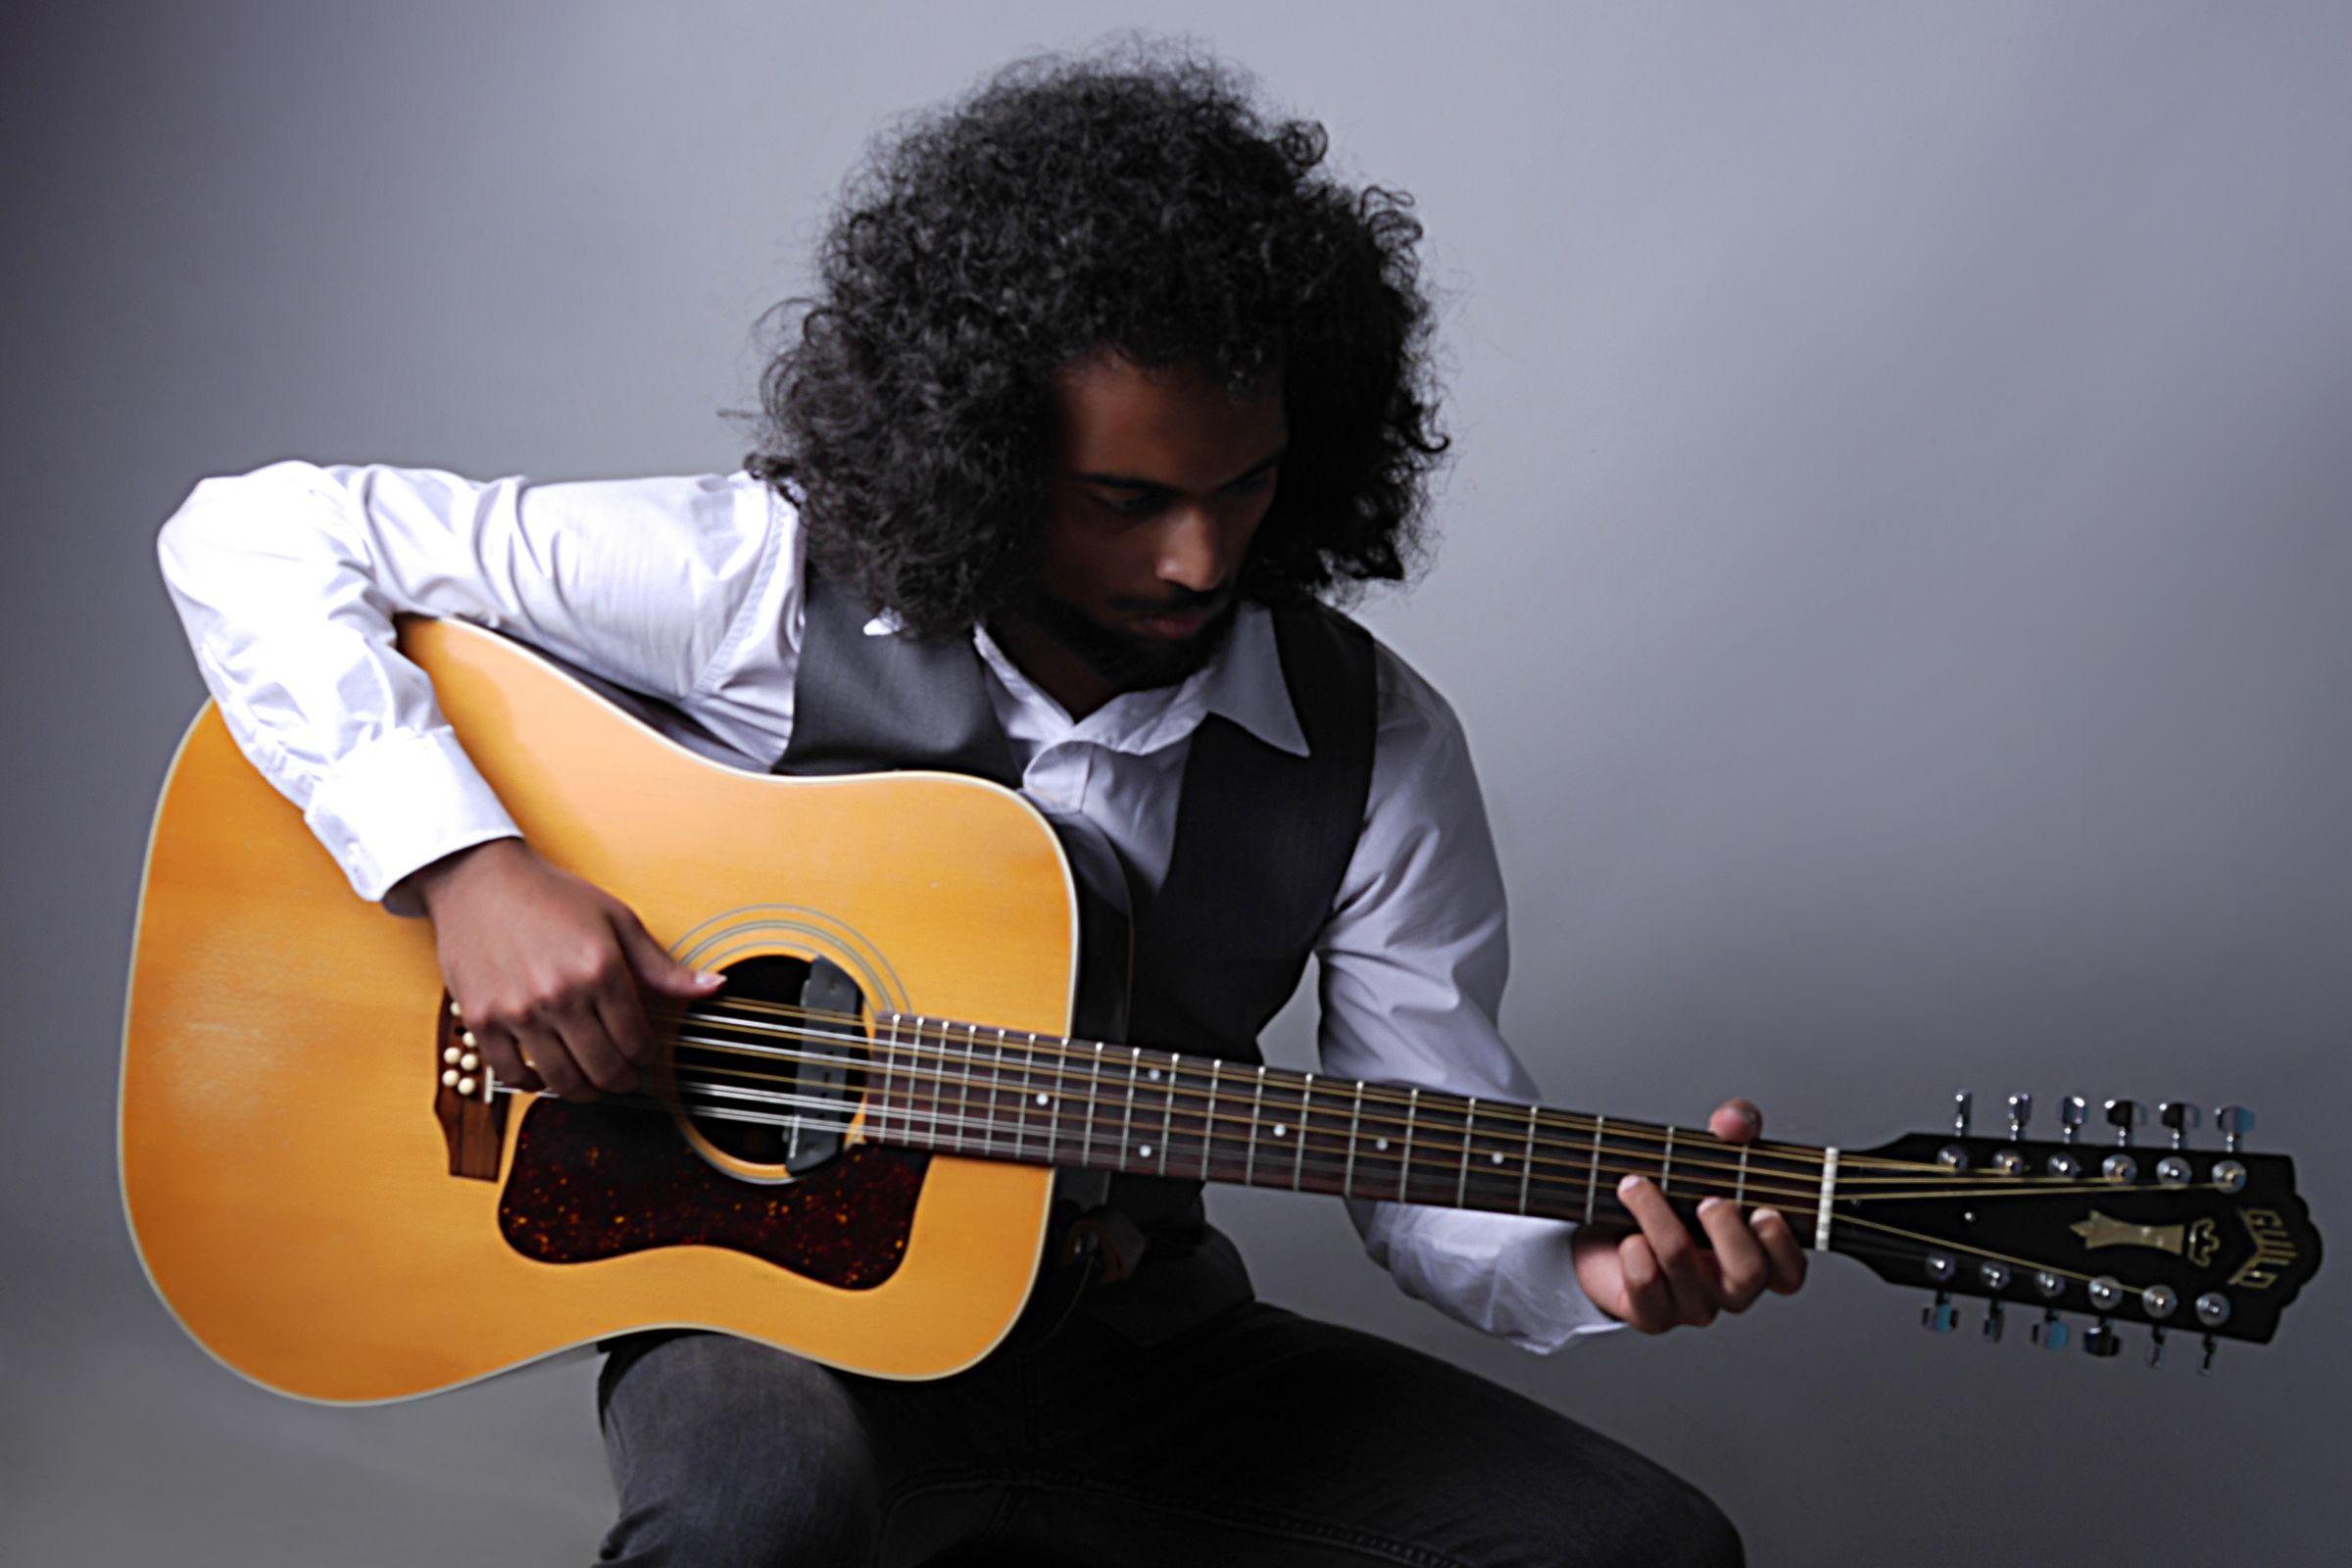 Sitting man holding a guitar